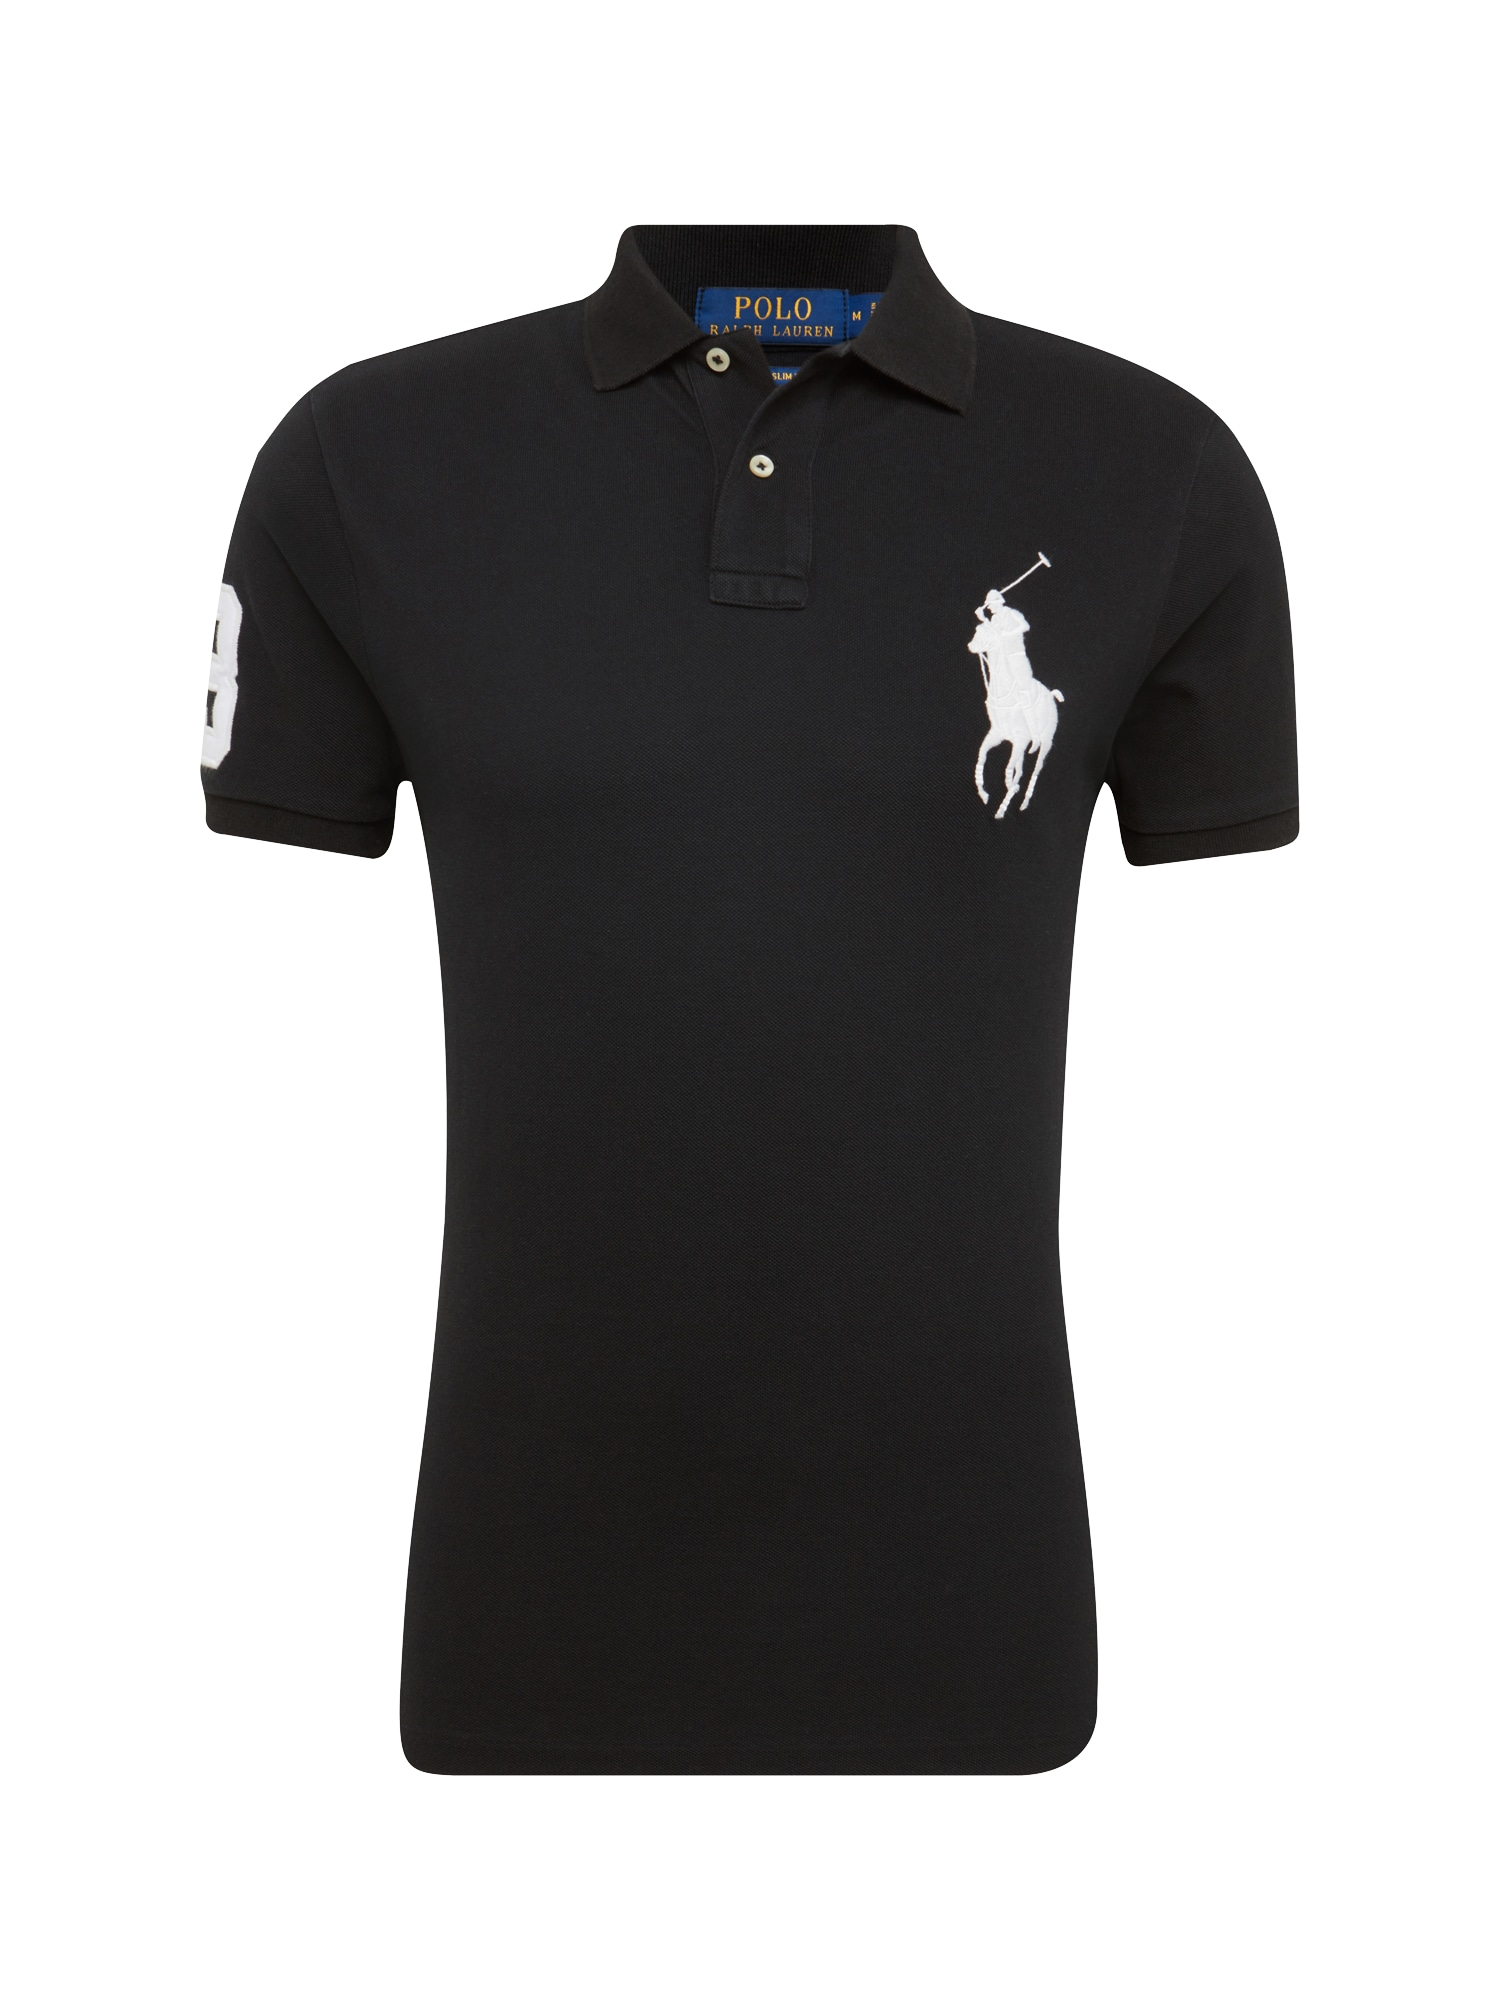 Tričko SSKCBPPCMSL-SHORT SLEEVE-KNIT černá bílá POLO RALPH LAUREN